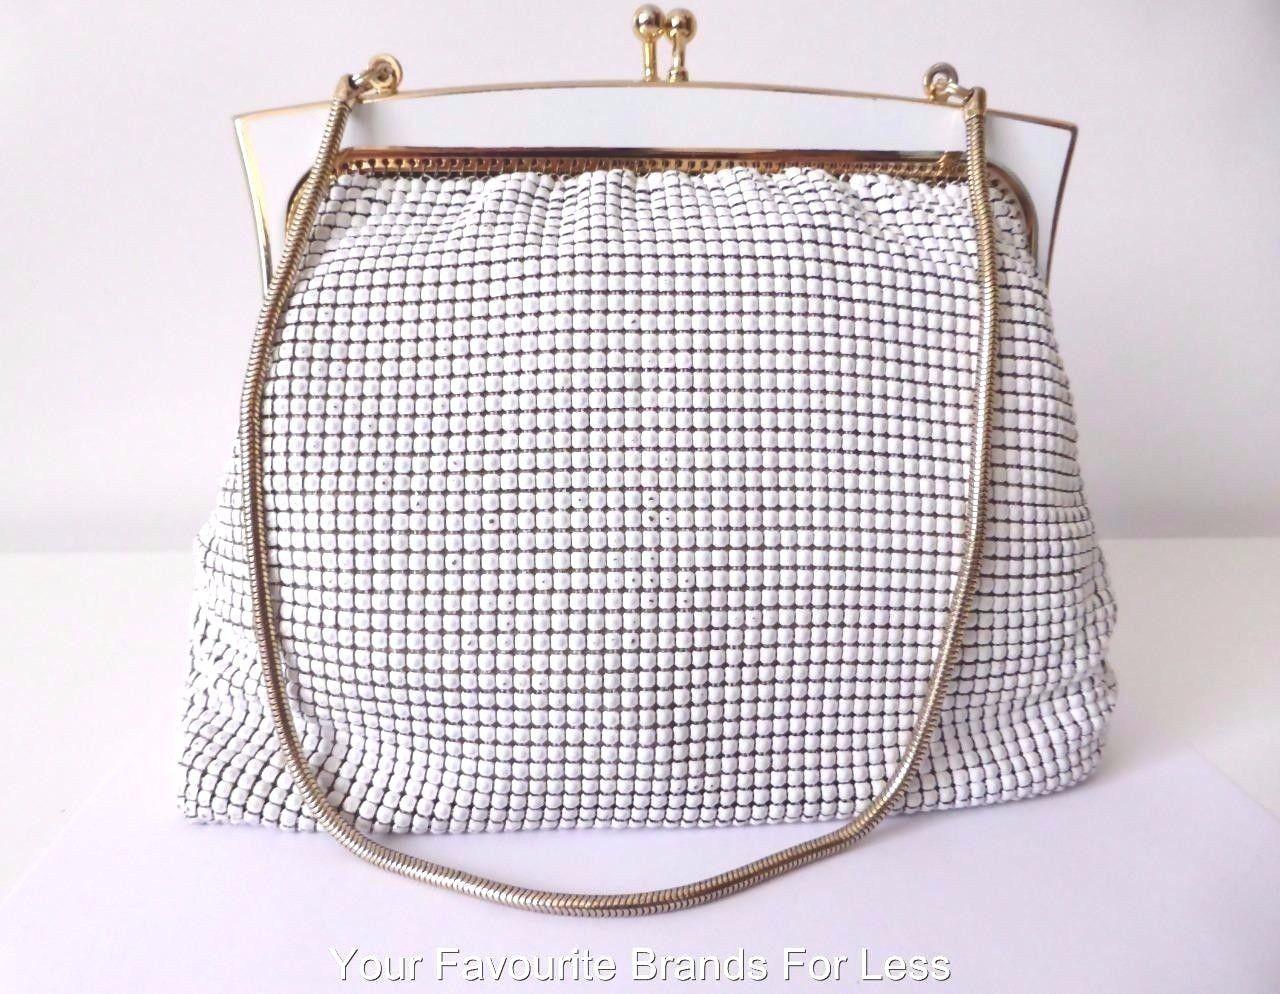 Glomesh Women S Bag Vintage White Mesh Evening Bag Made In Australia Ebay Eveningbagsvintage Vintage Evening Bags Evening Bags Bag Making